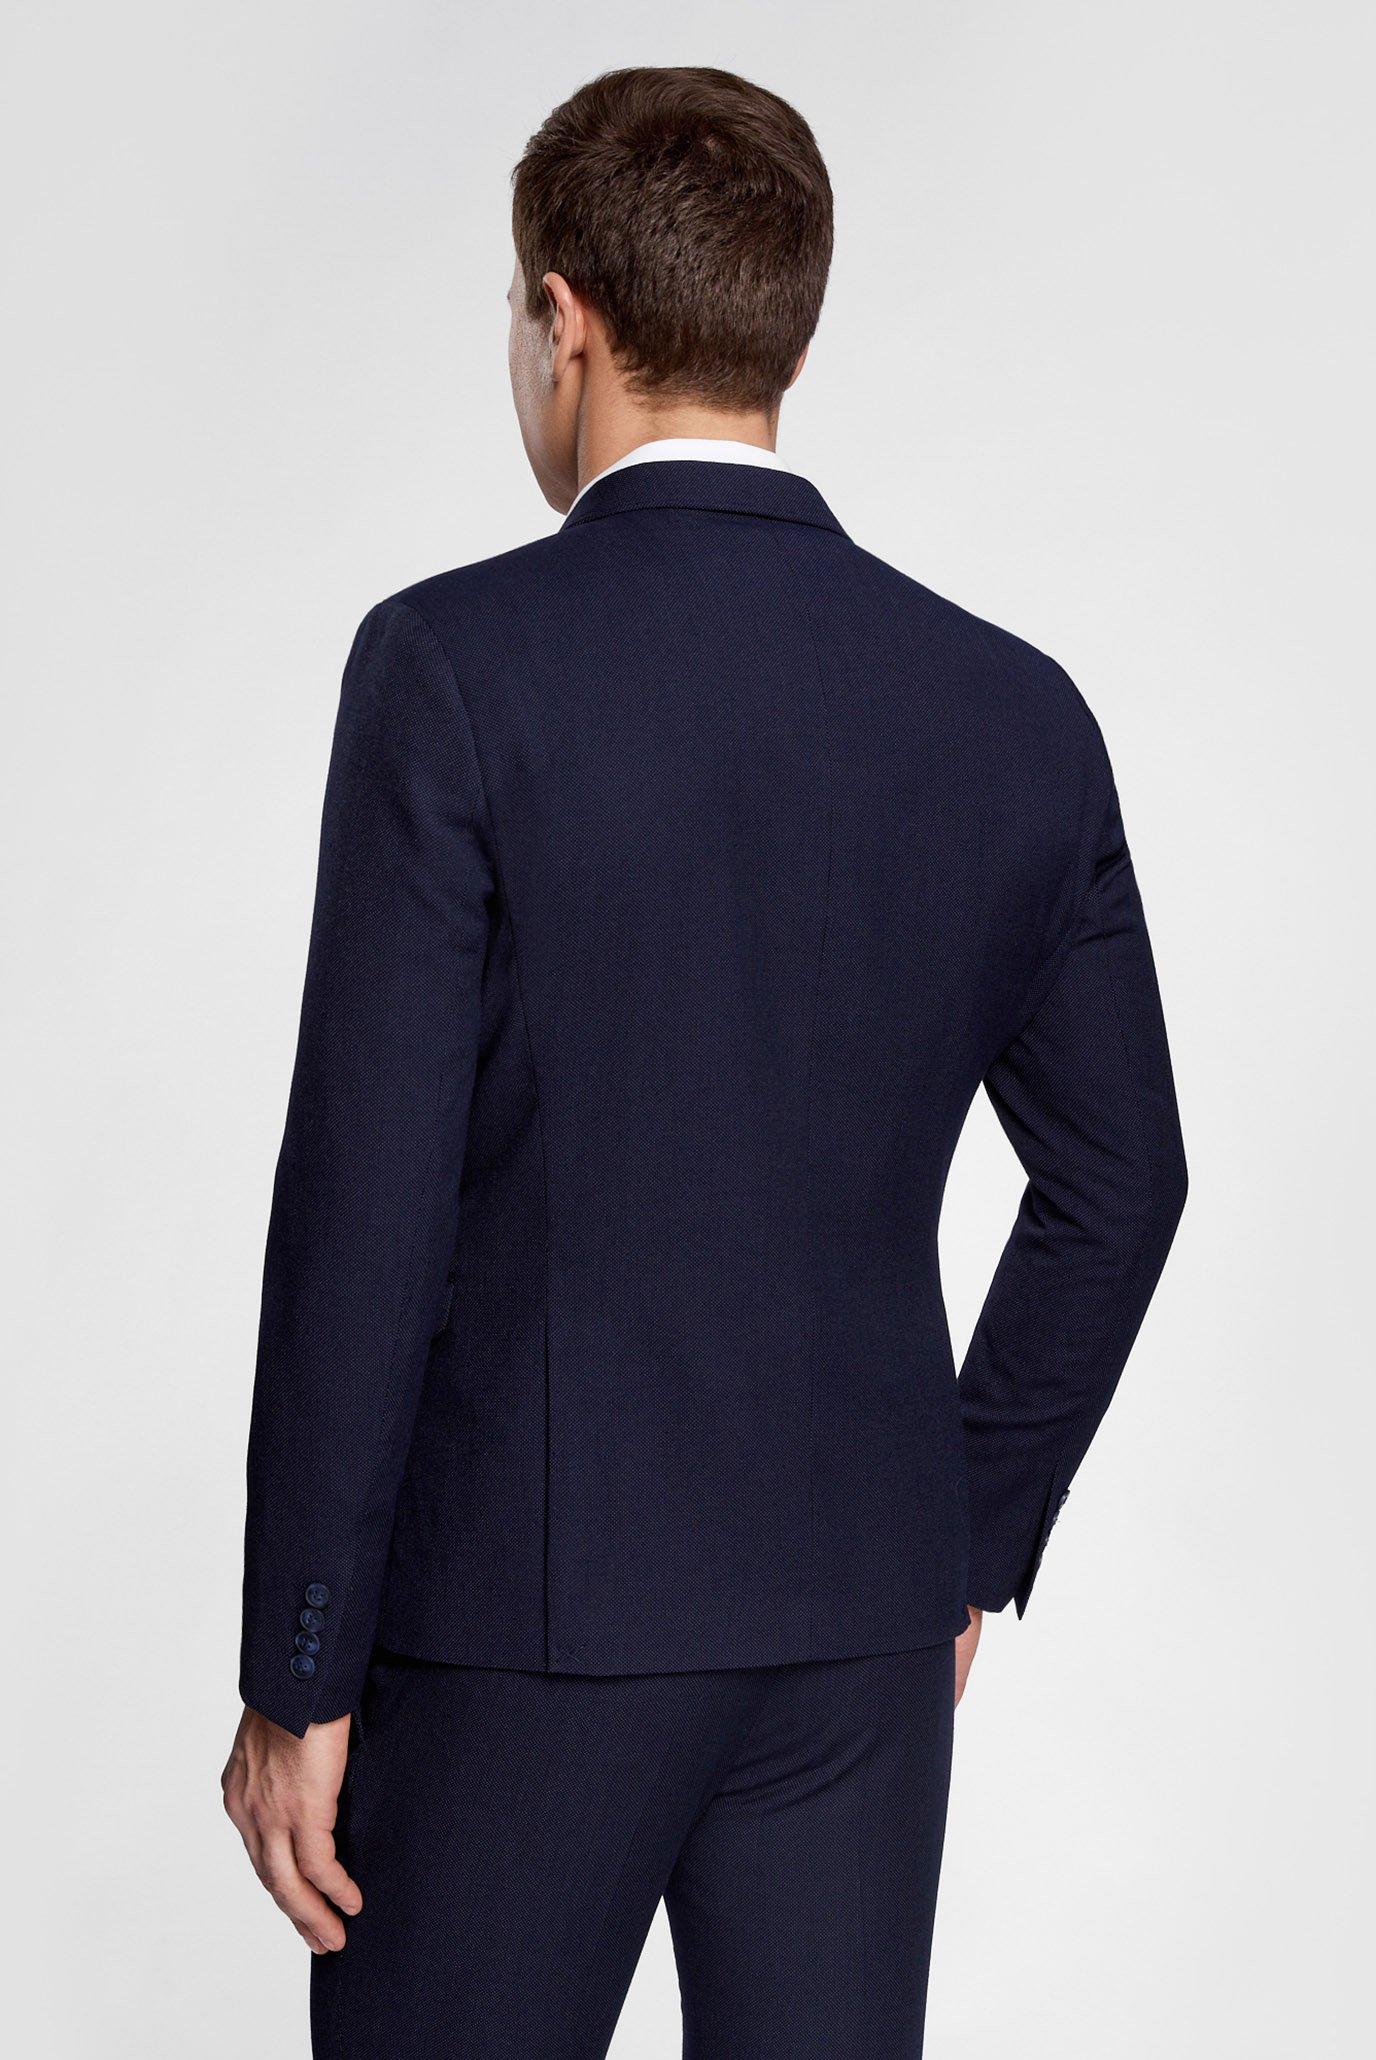 Купить Мужской темно-синий пиджак Oodji Oodji 2L420185M/46311N/7900O – Киев, Украина. Цены в интернет магазине MD Fashion